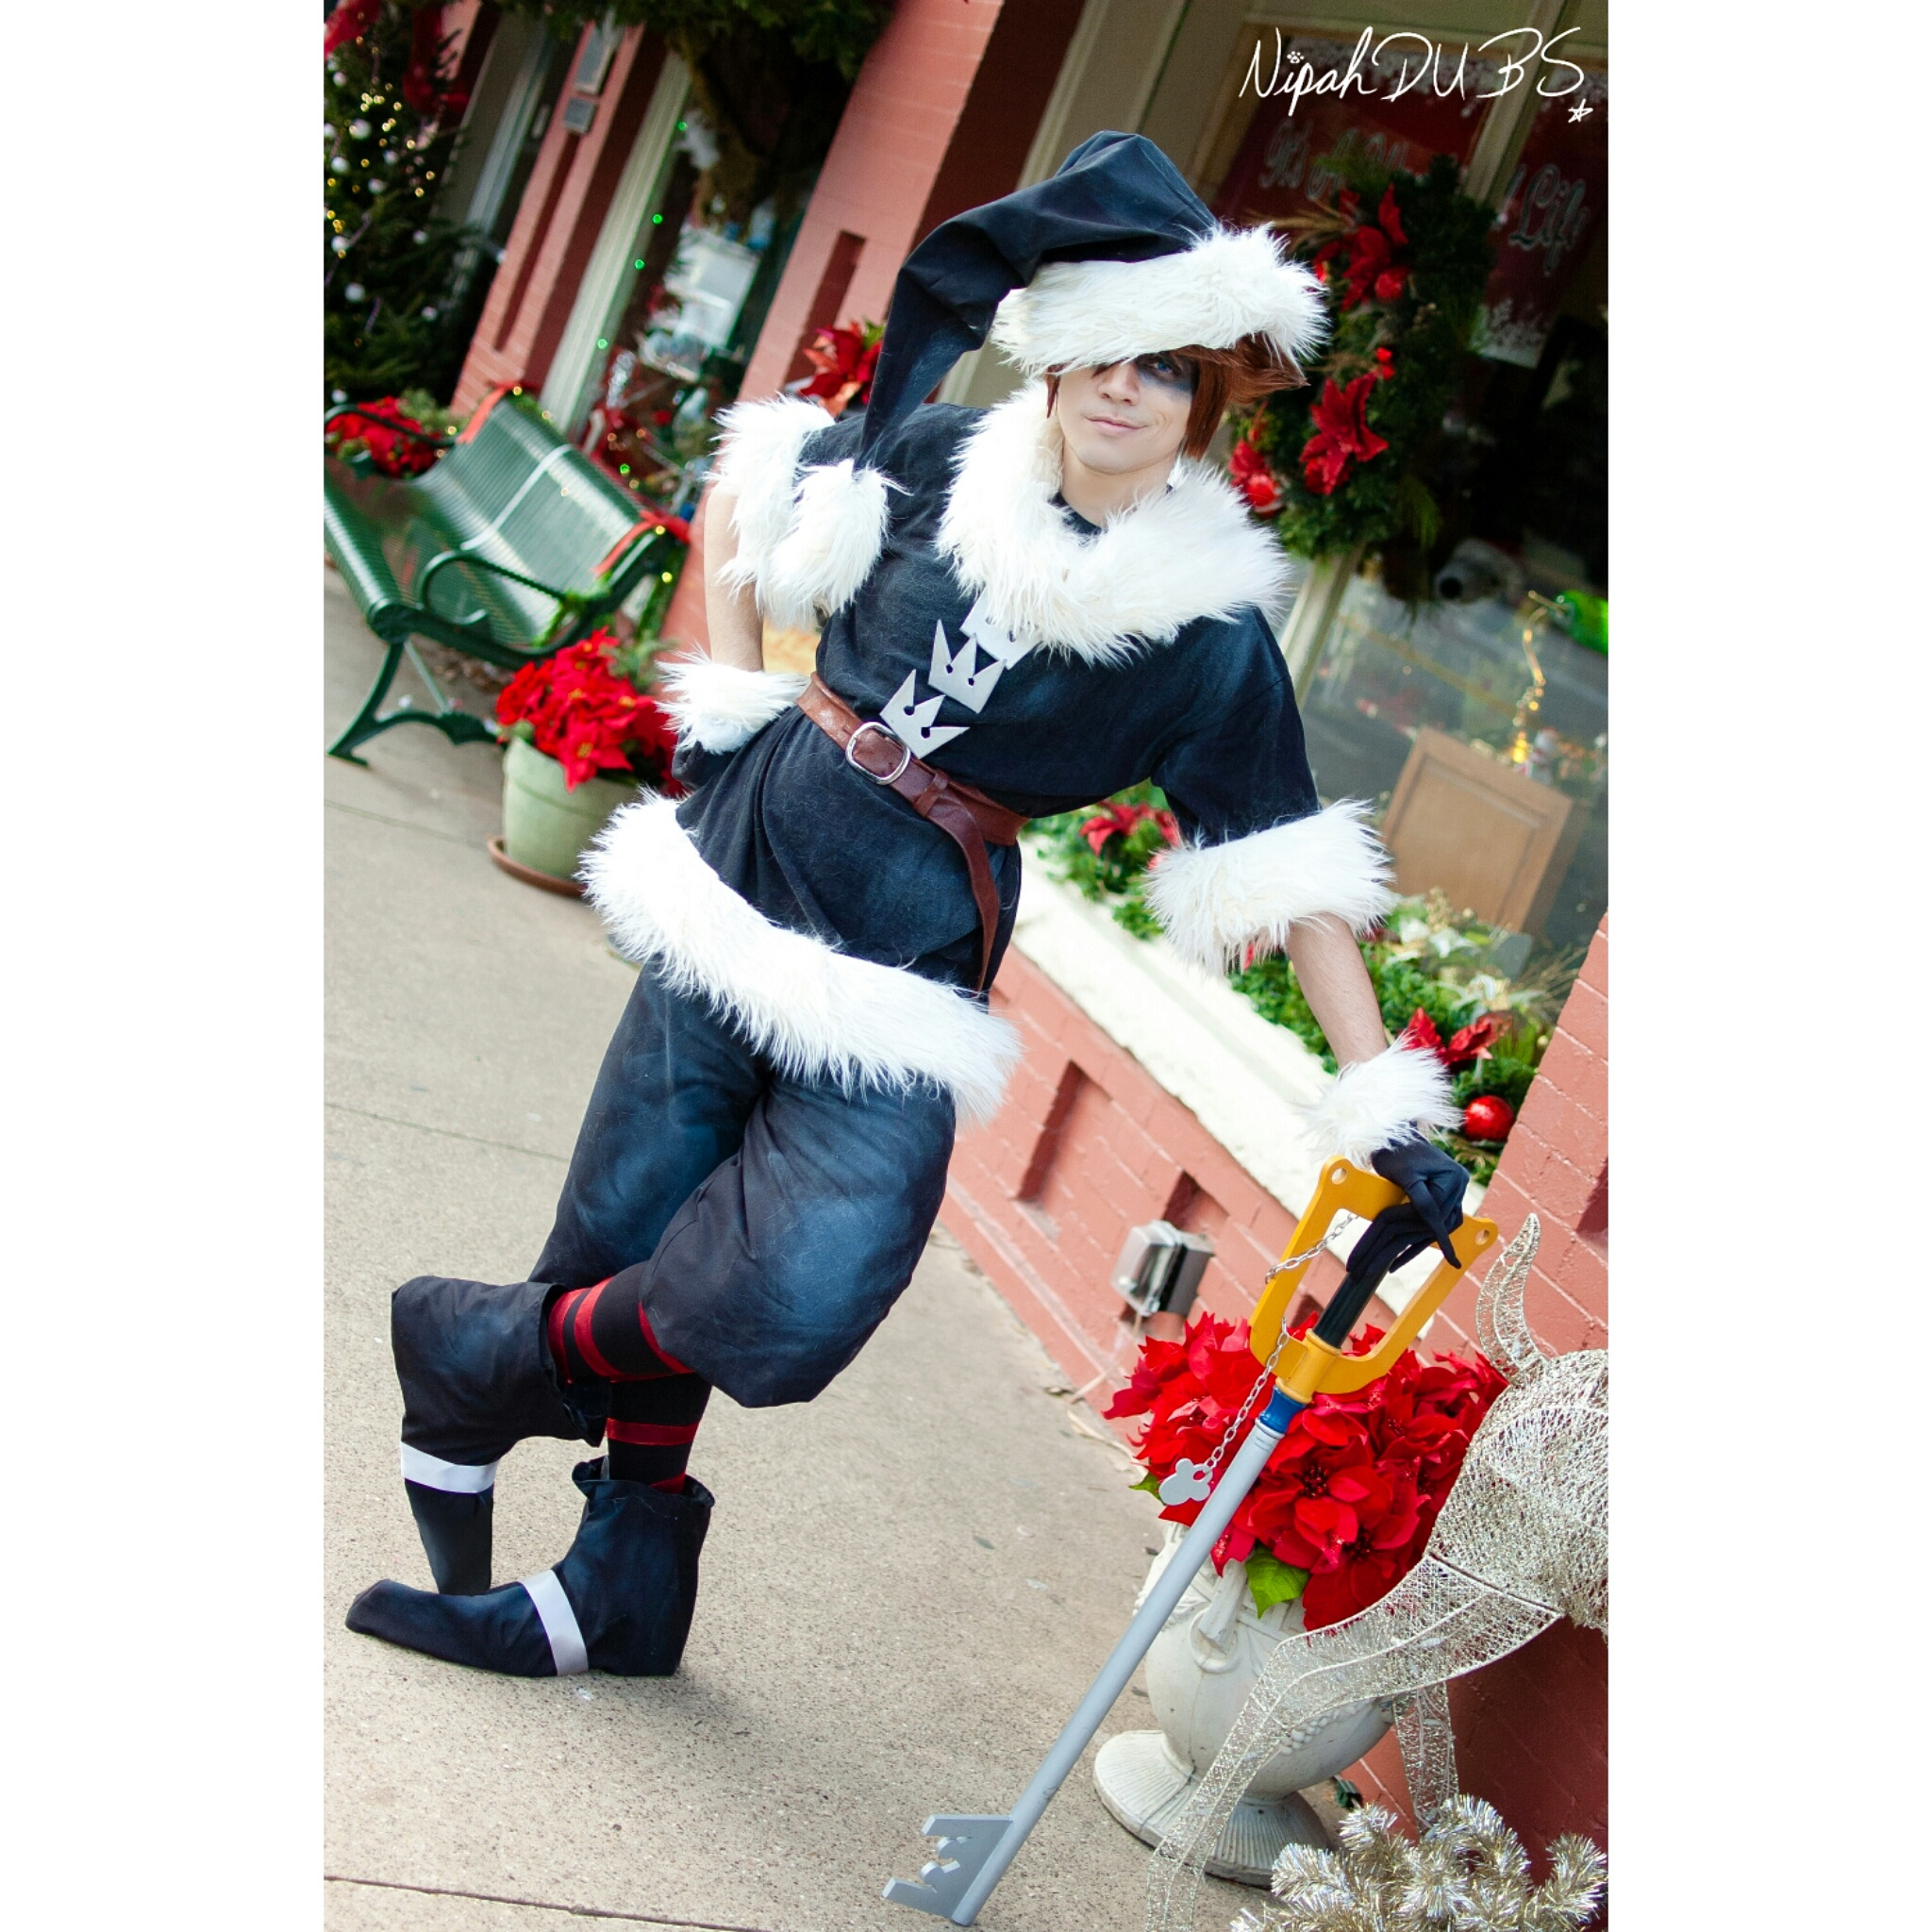 Christmas Town Sora (Kingdom Hearts) Print · NipahDUBS · Online ...